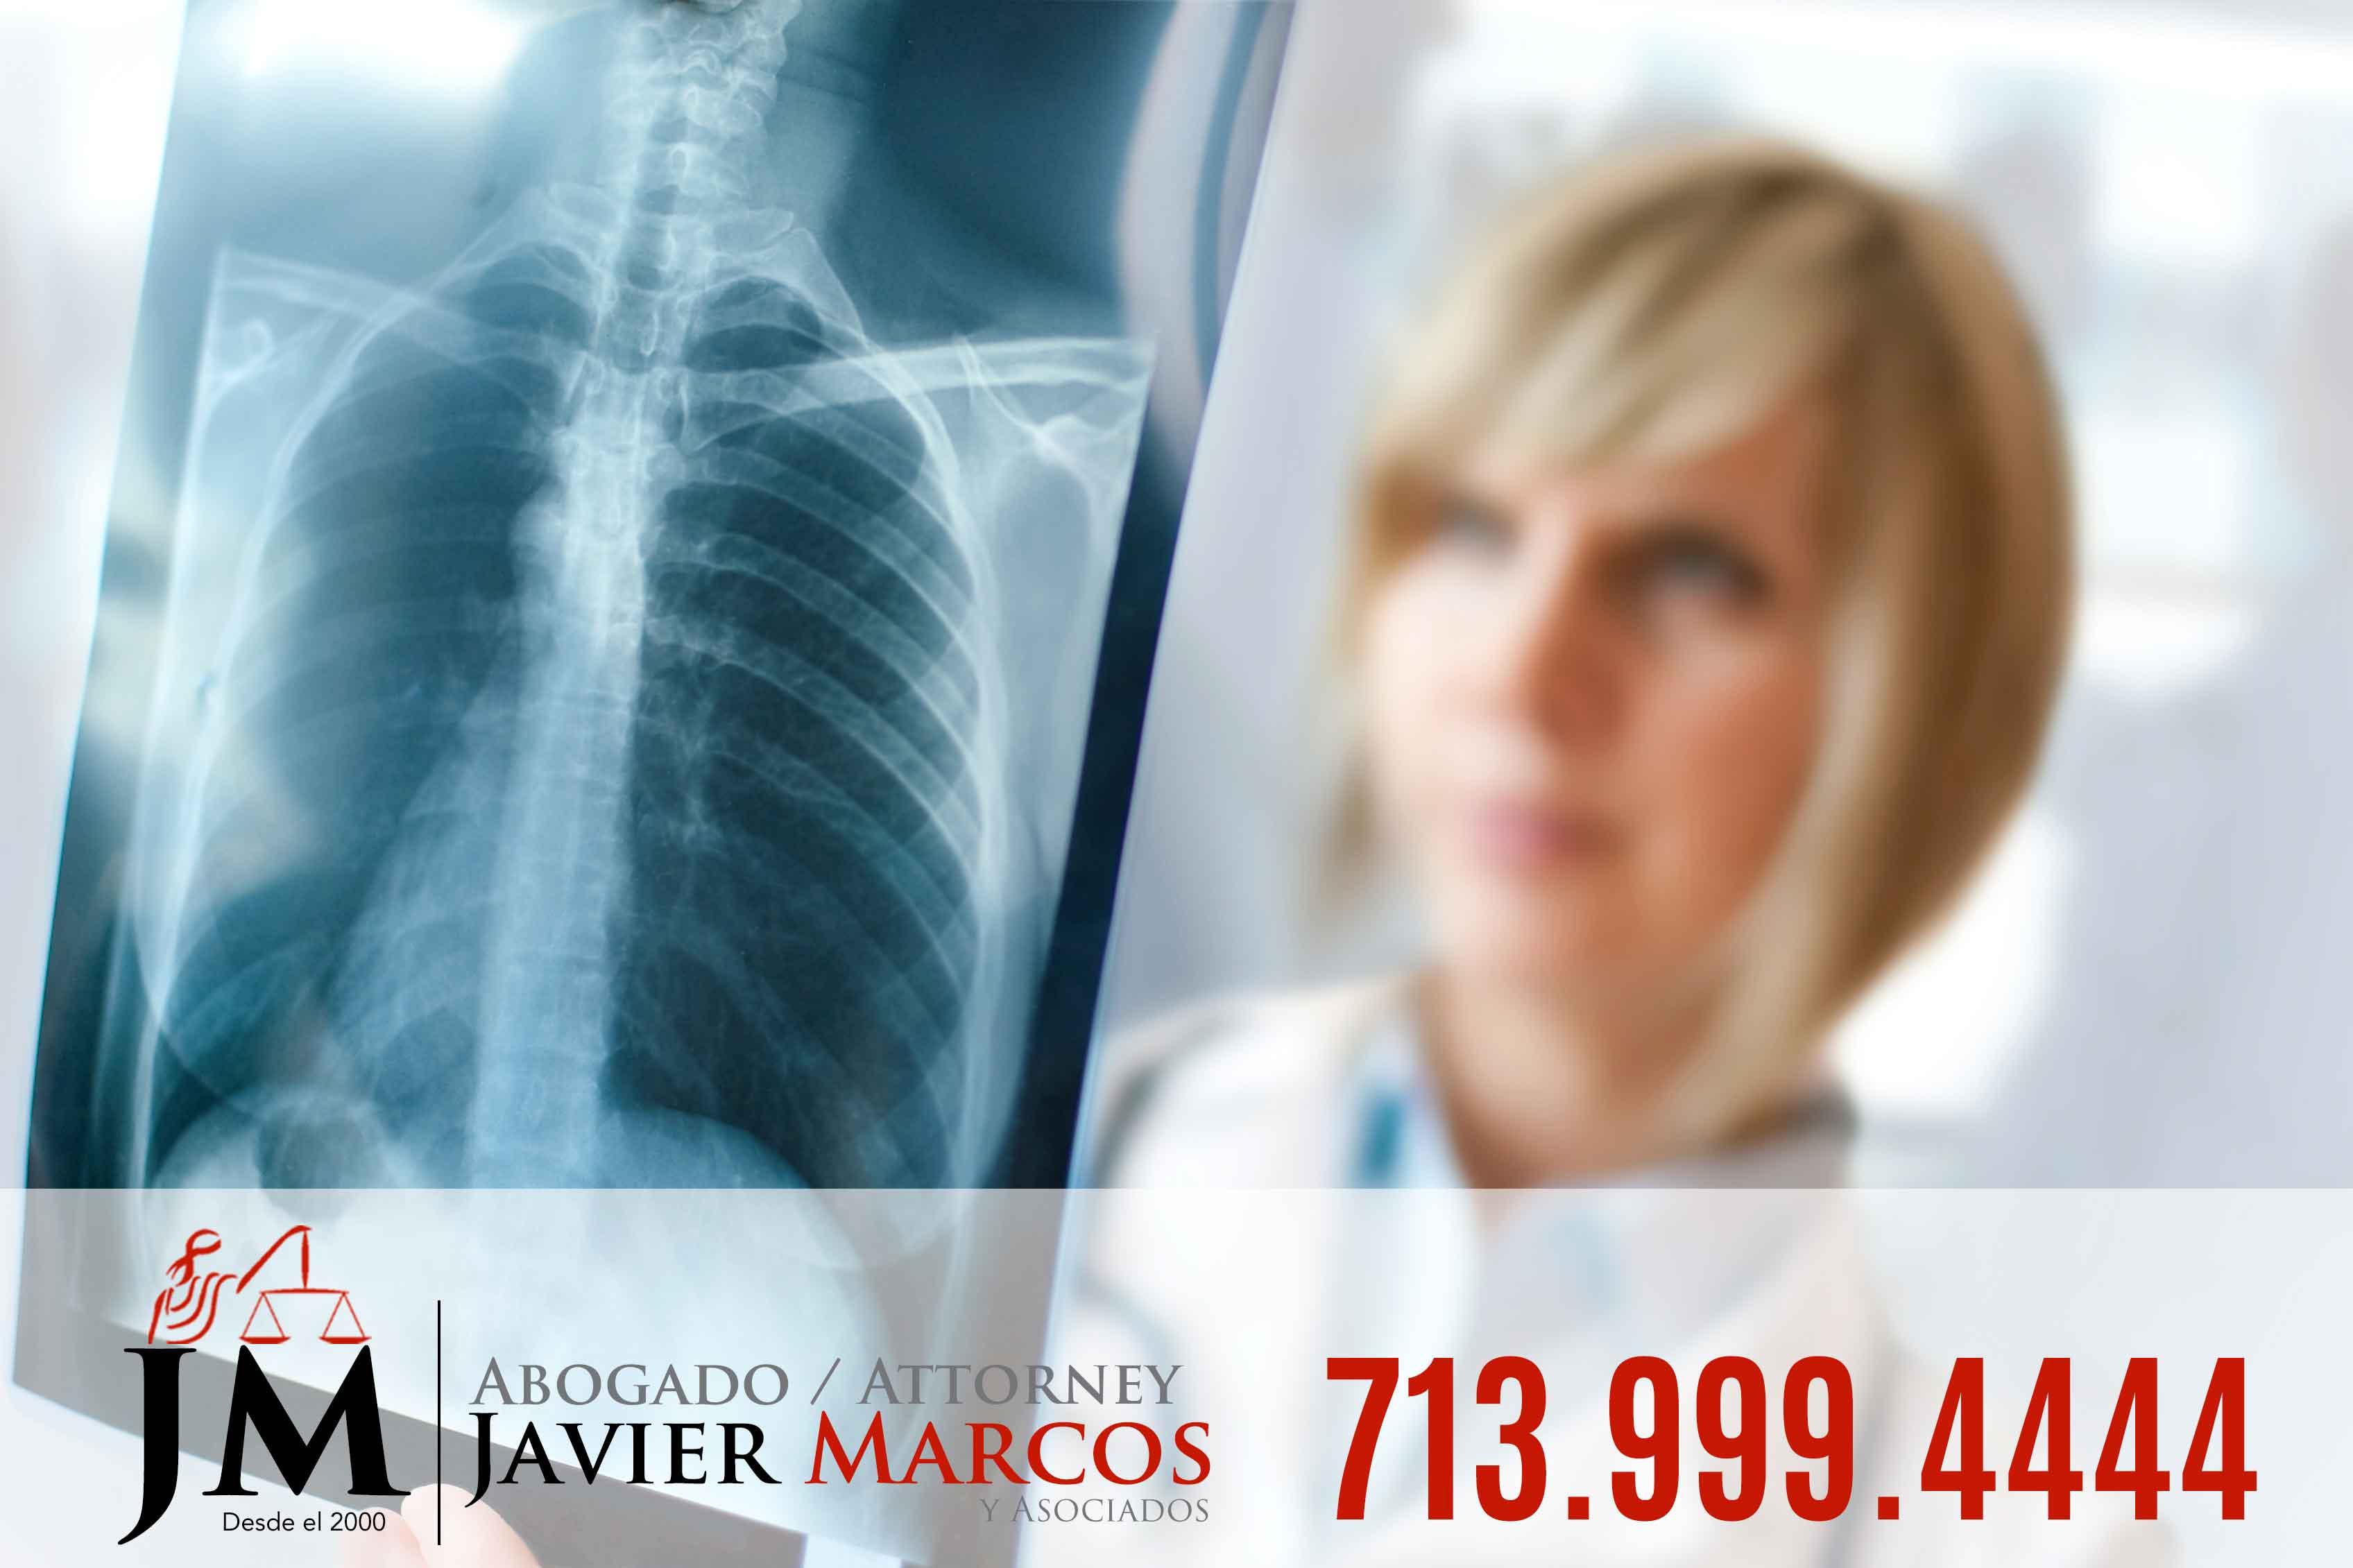 Abogado Exposicion quimicos | Abogado Javier Marcos | 713.999.4444